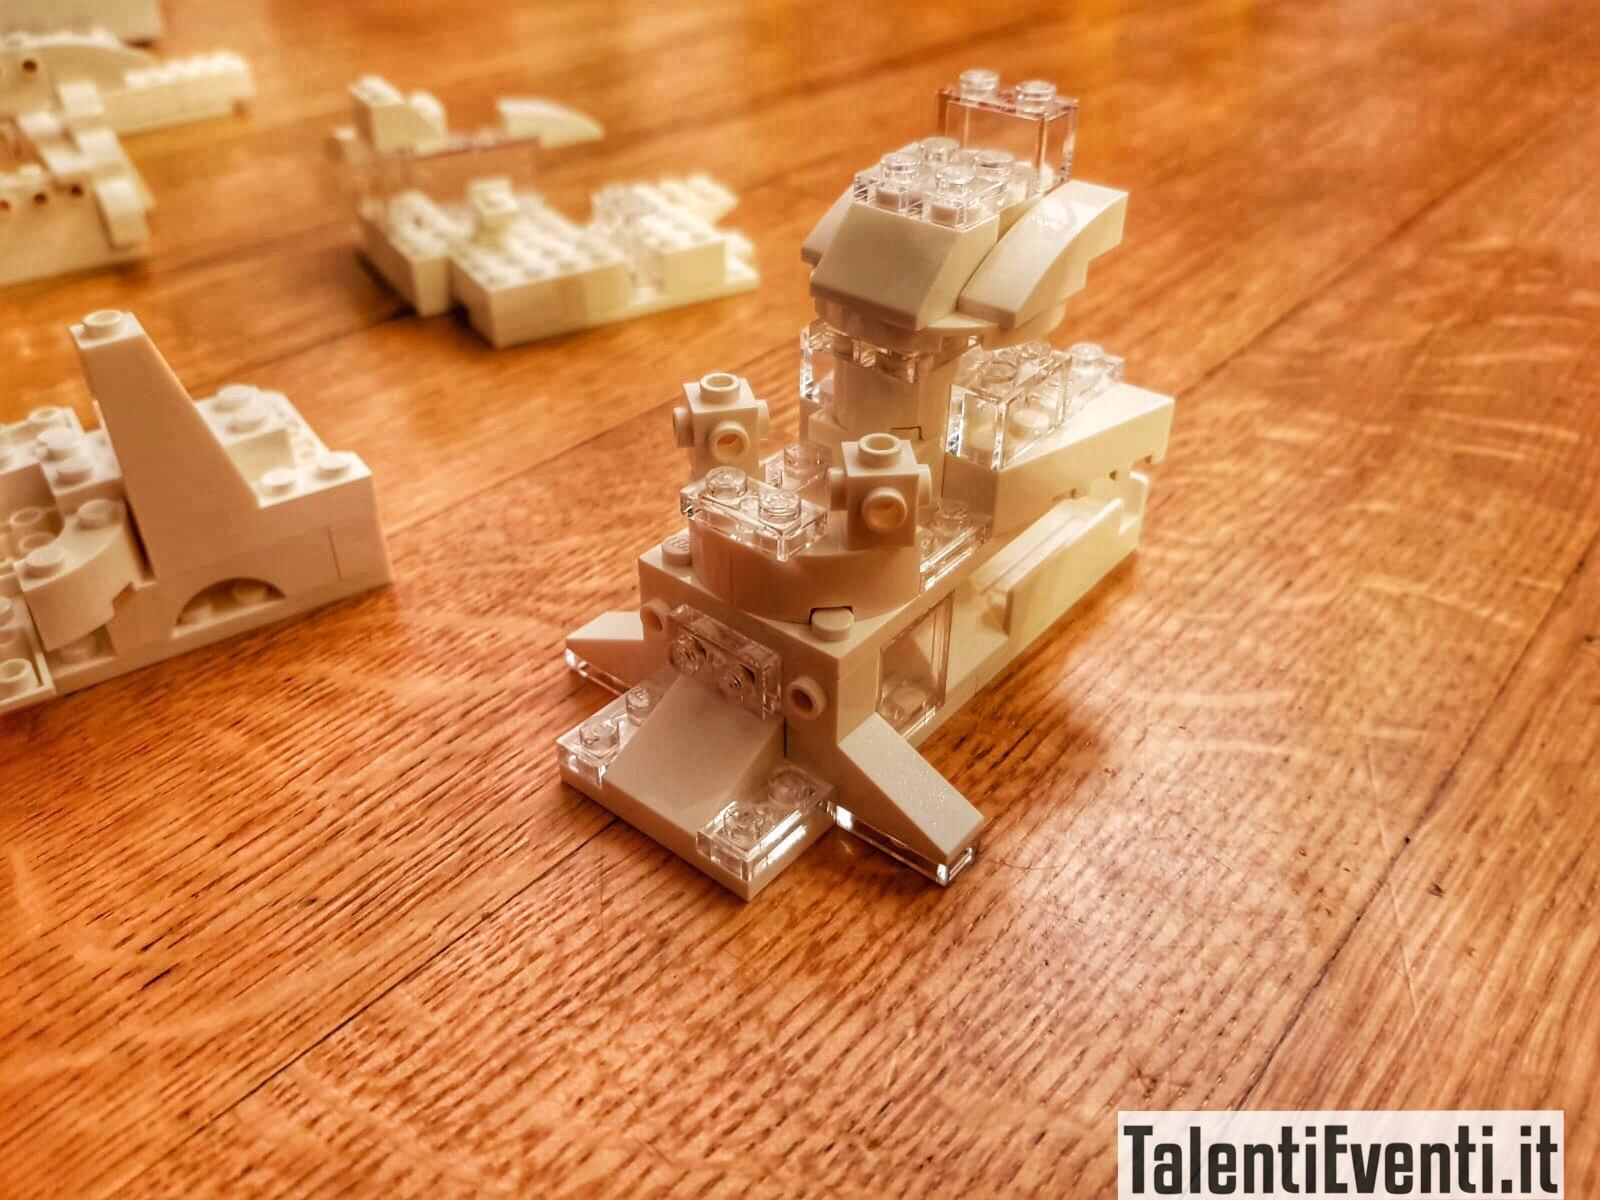 talenti-eventi-5- regali-creativi-per-professionisti-stressati-3